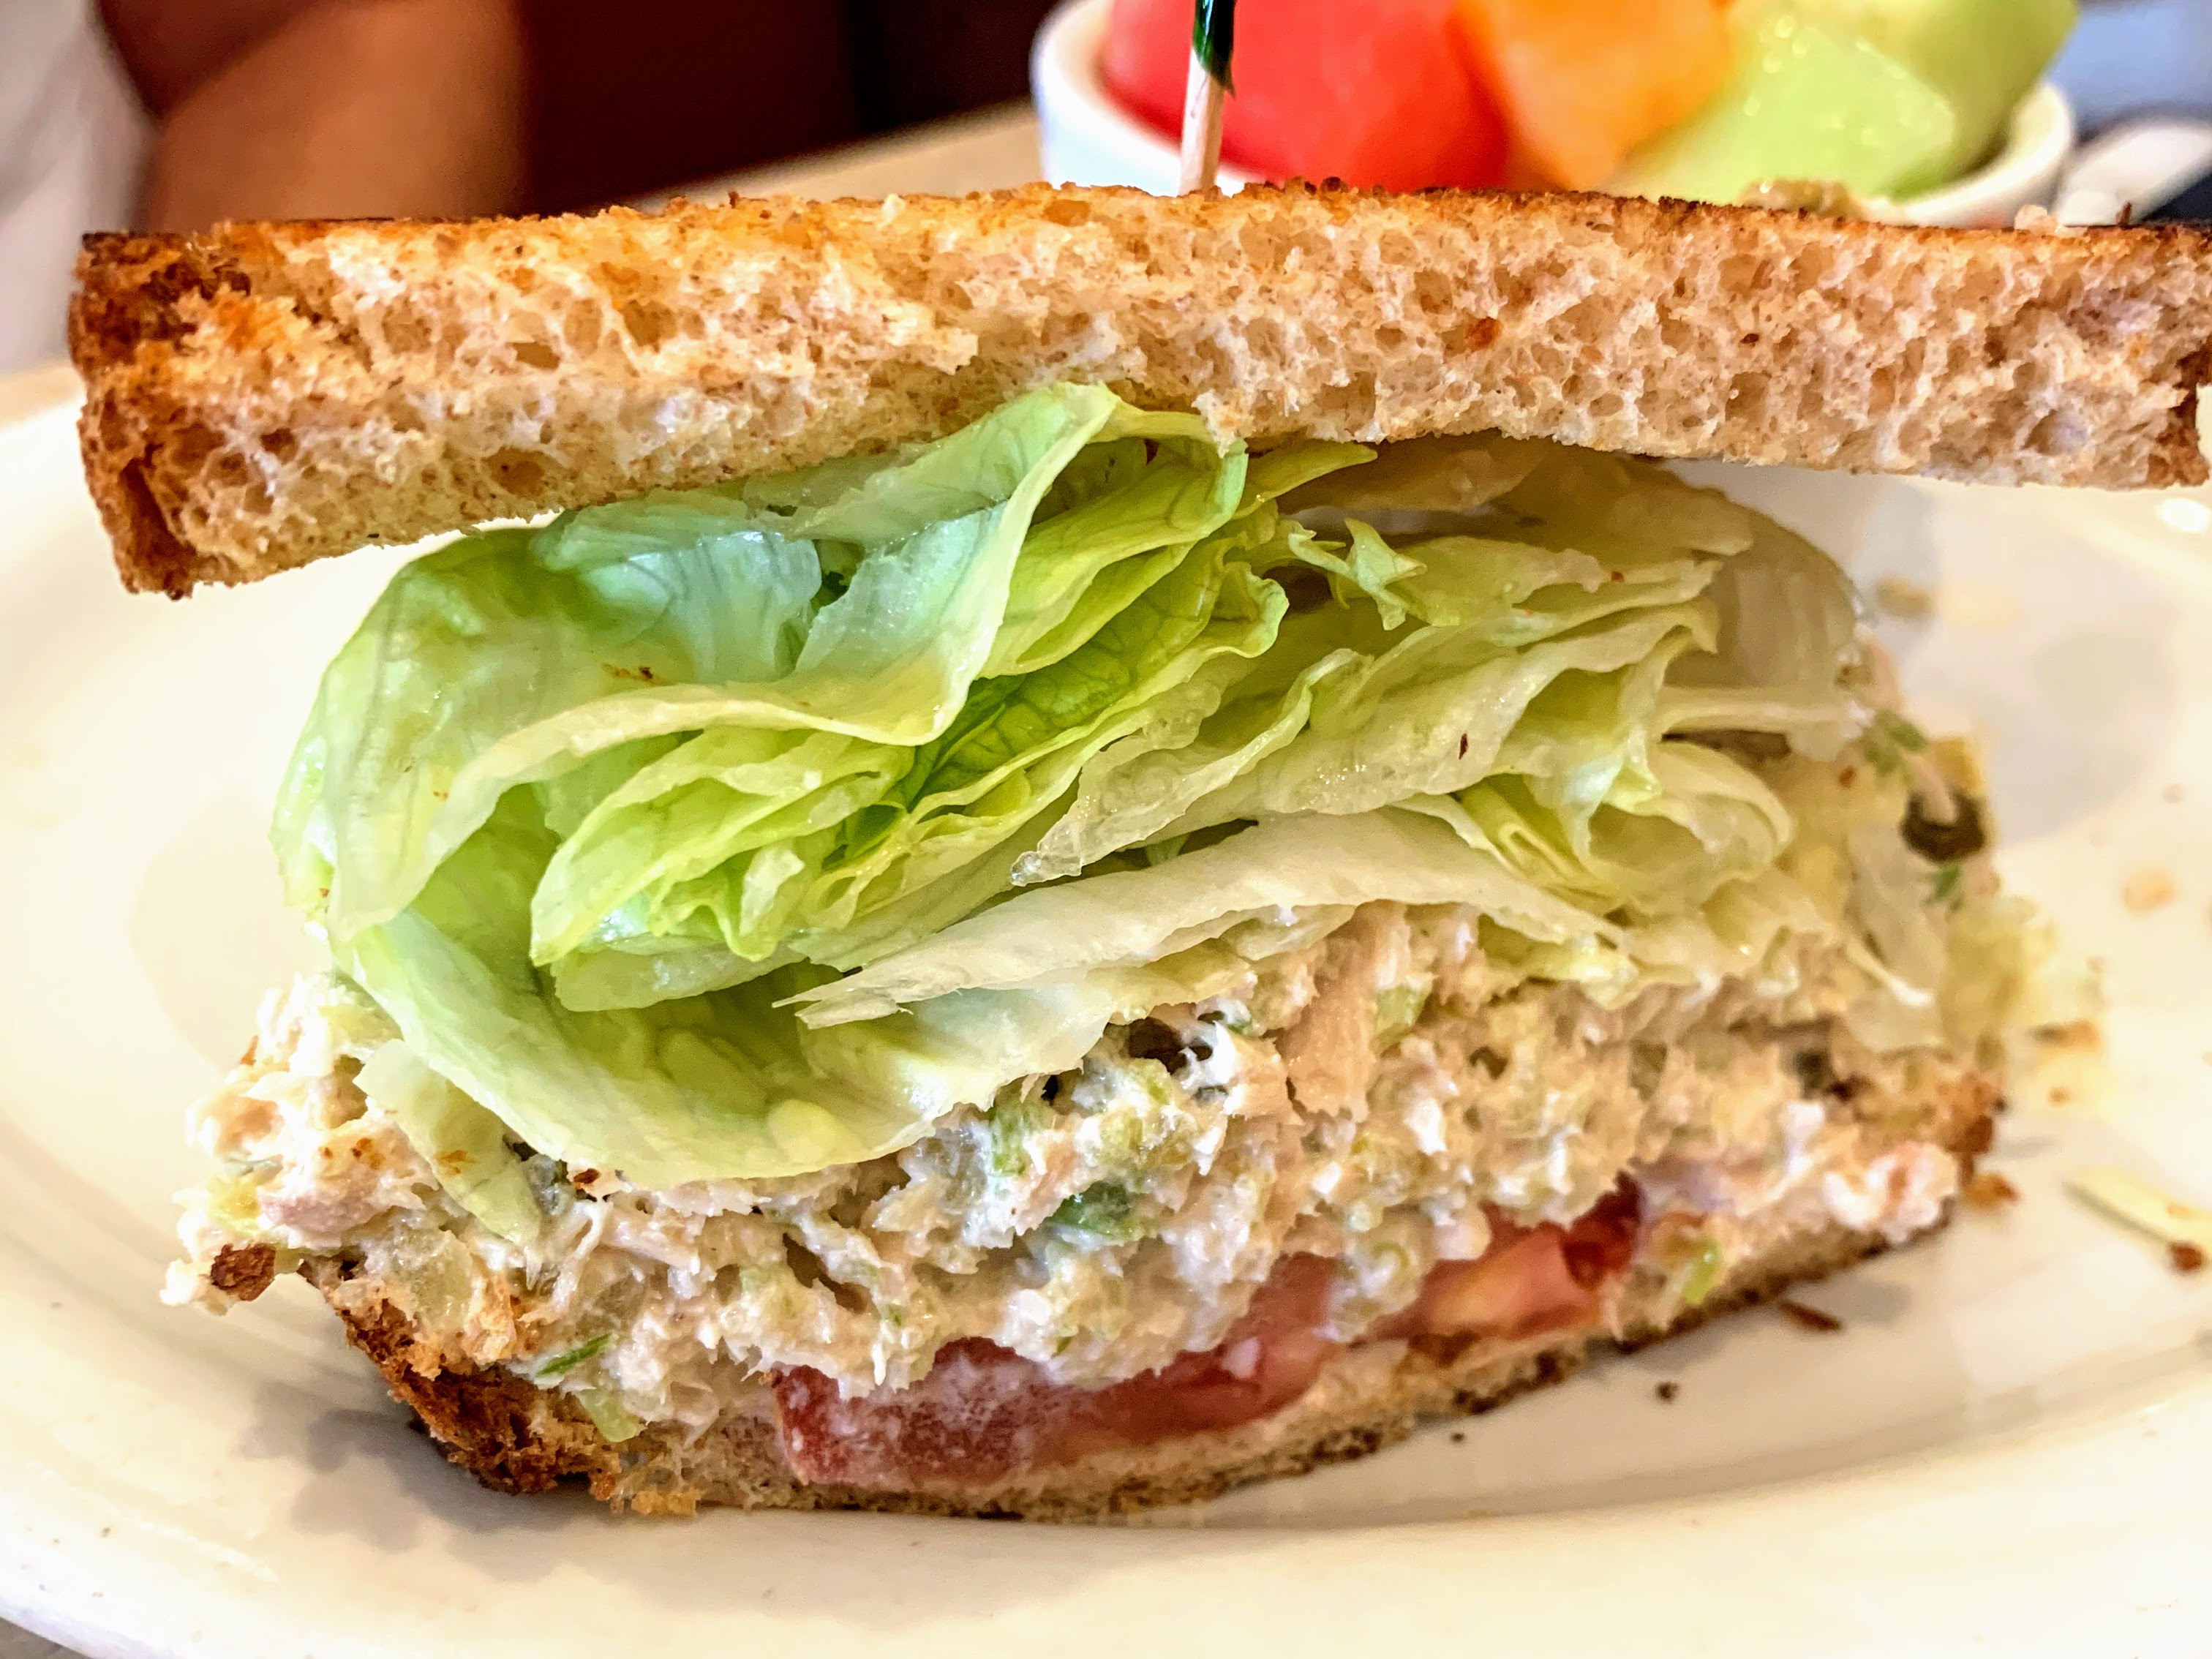 Cobian's Tuna Sandwich